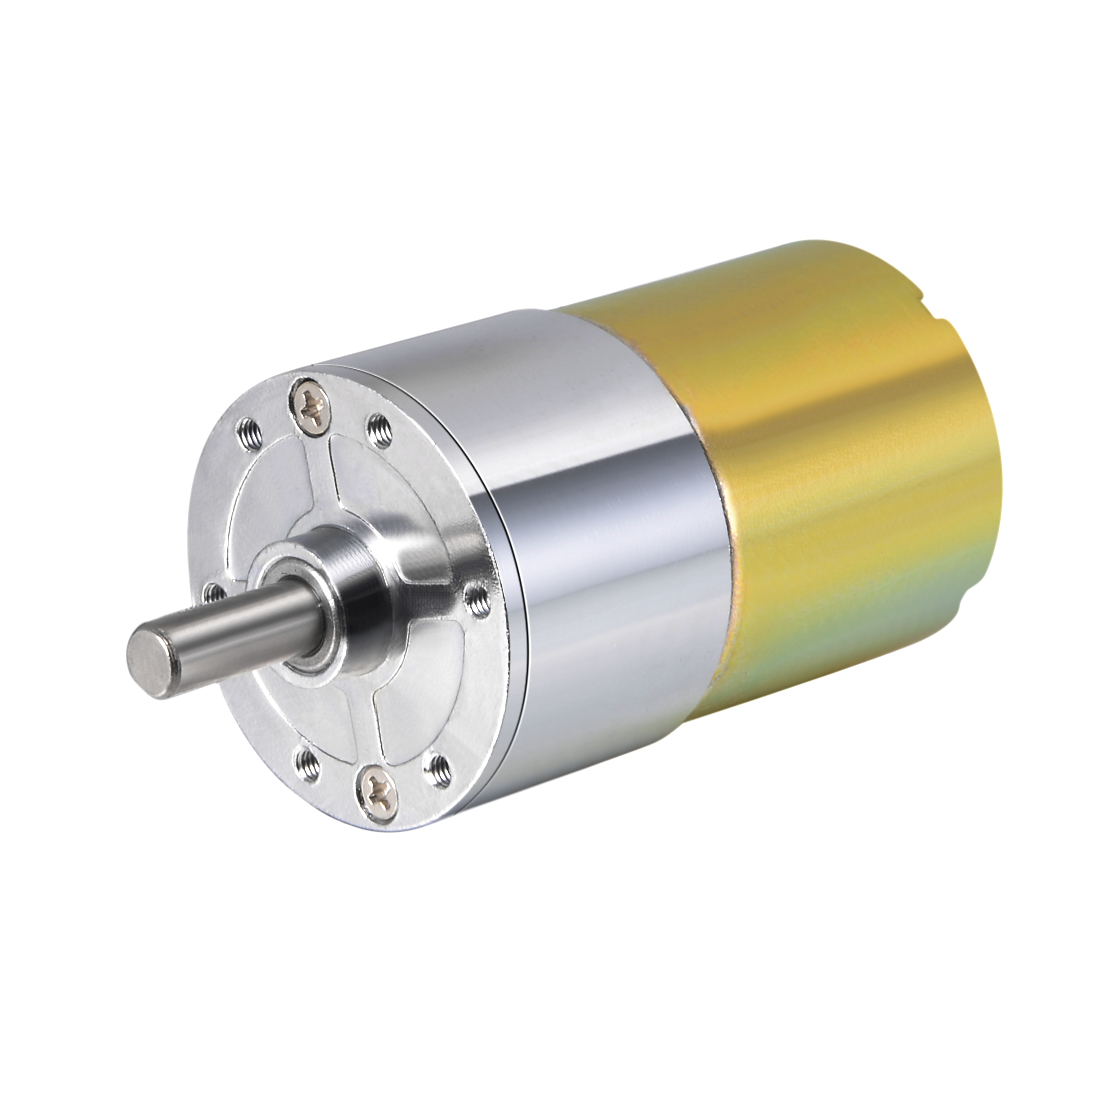 12V DC 200 RPM Gear Motor High Torque Reduction Gearbox Centric Output Shaft